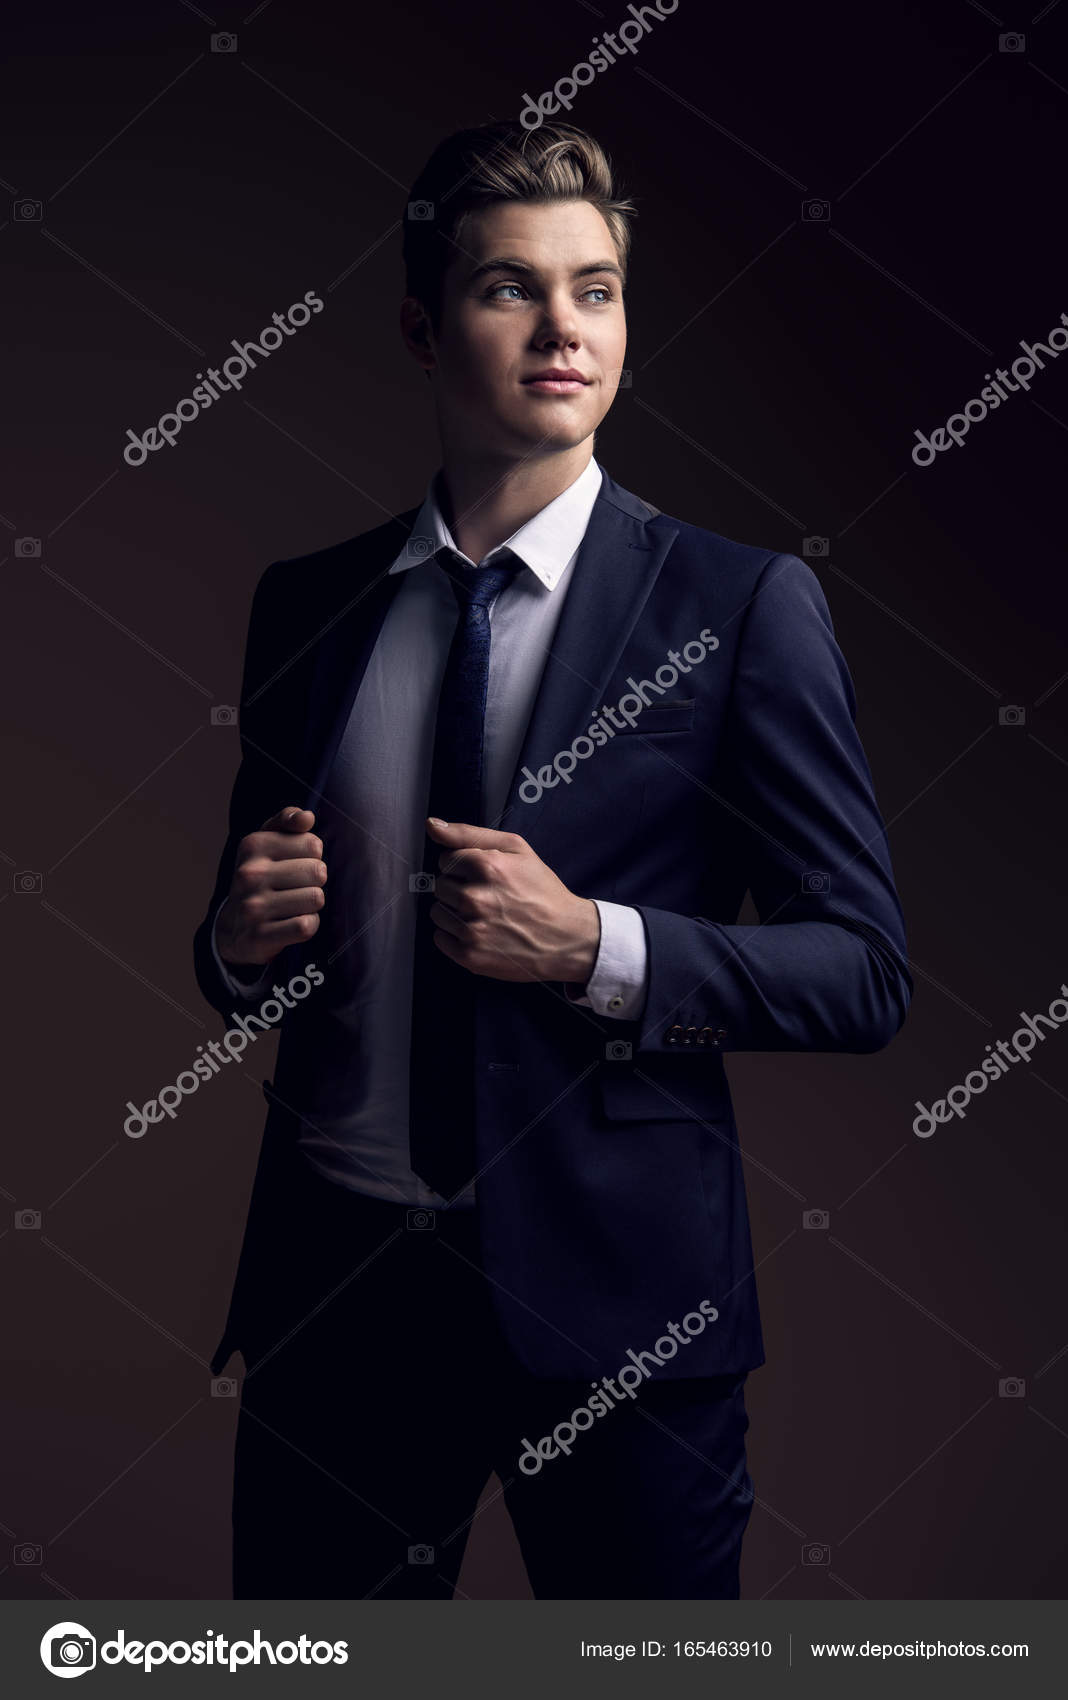 c0e3baa3e5d7 κλασσικό ανδρικό κοστούμι — Φωτογραφία Αρχείου © prometeus  165463910